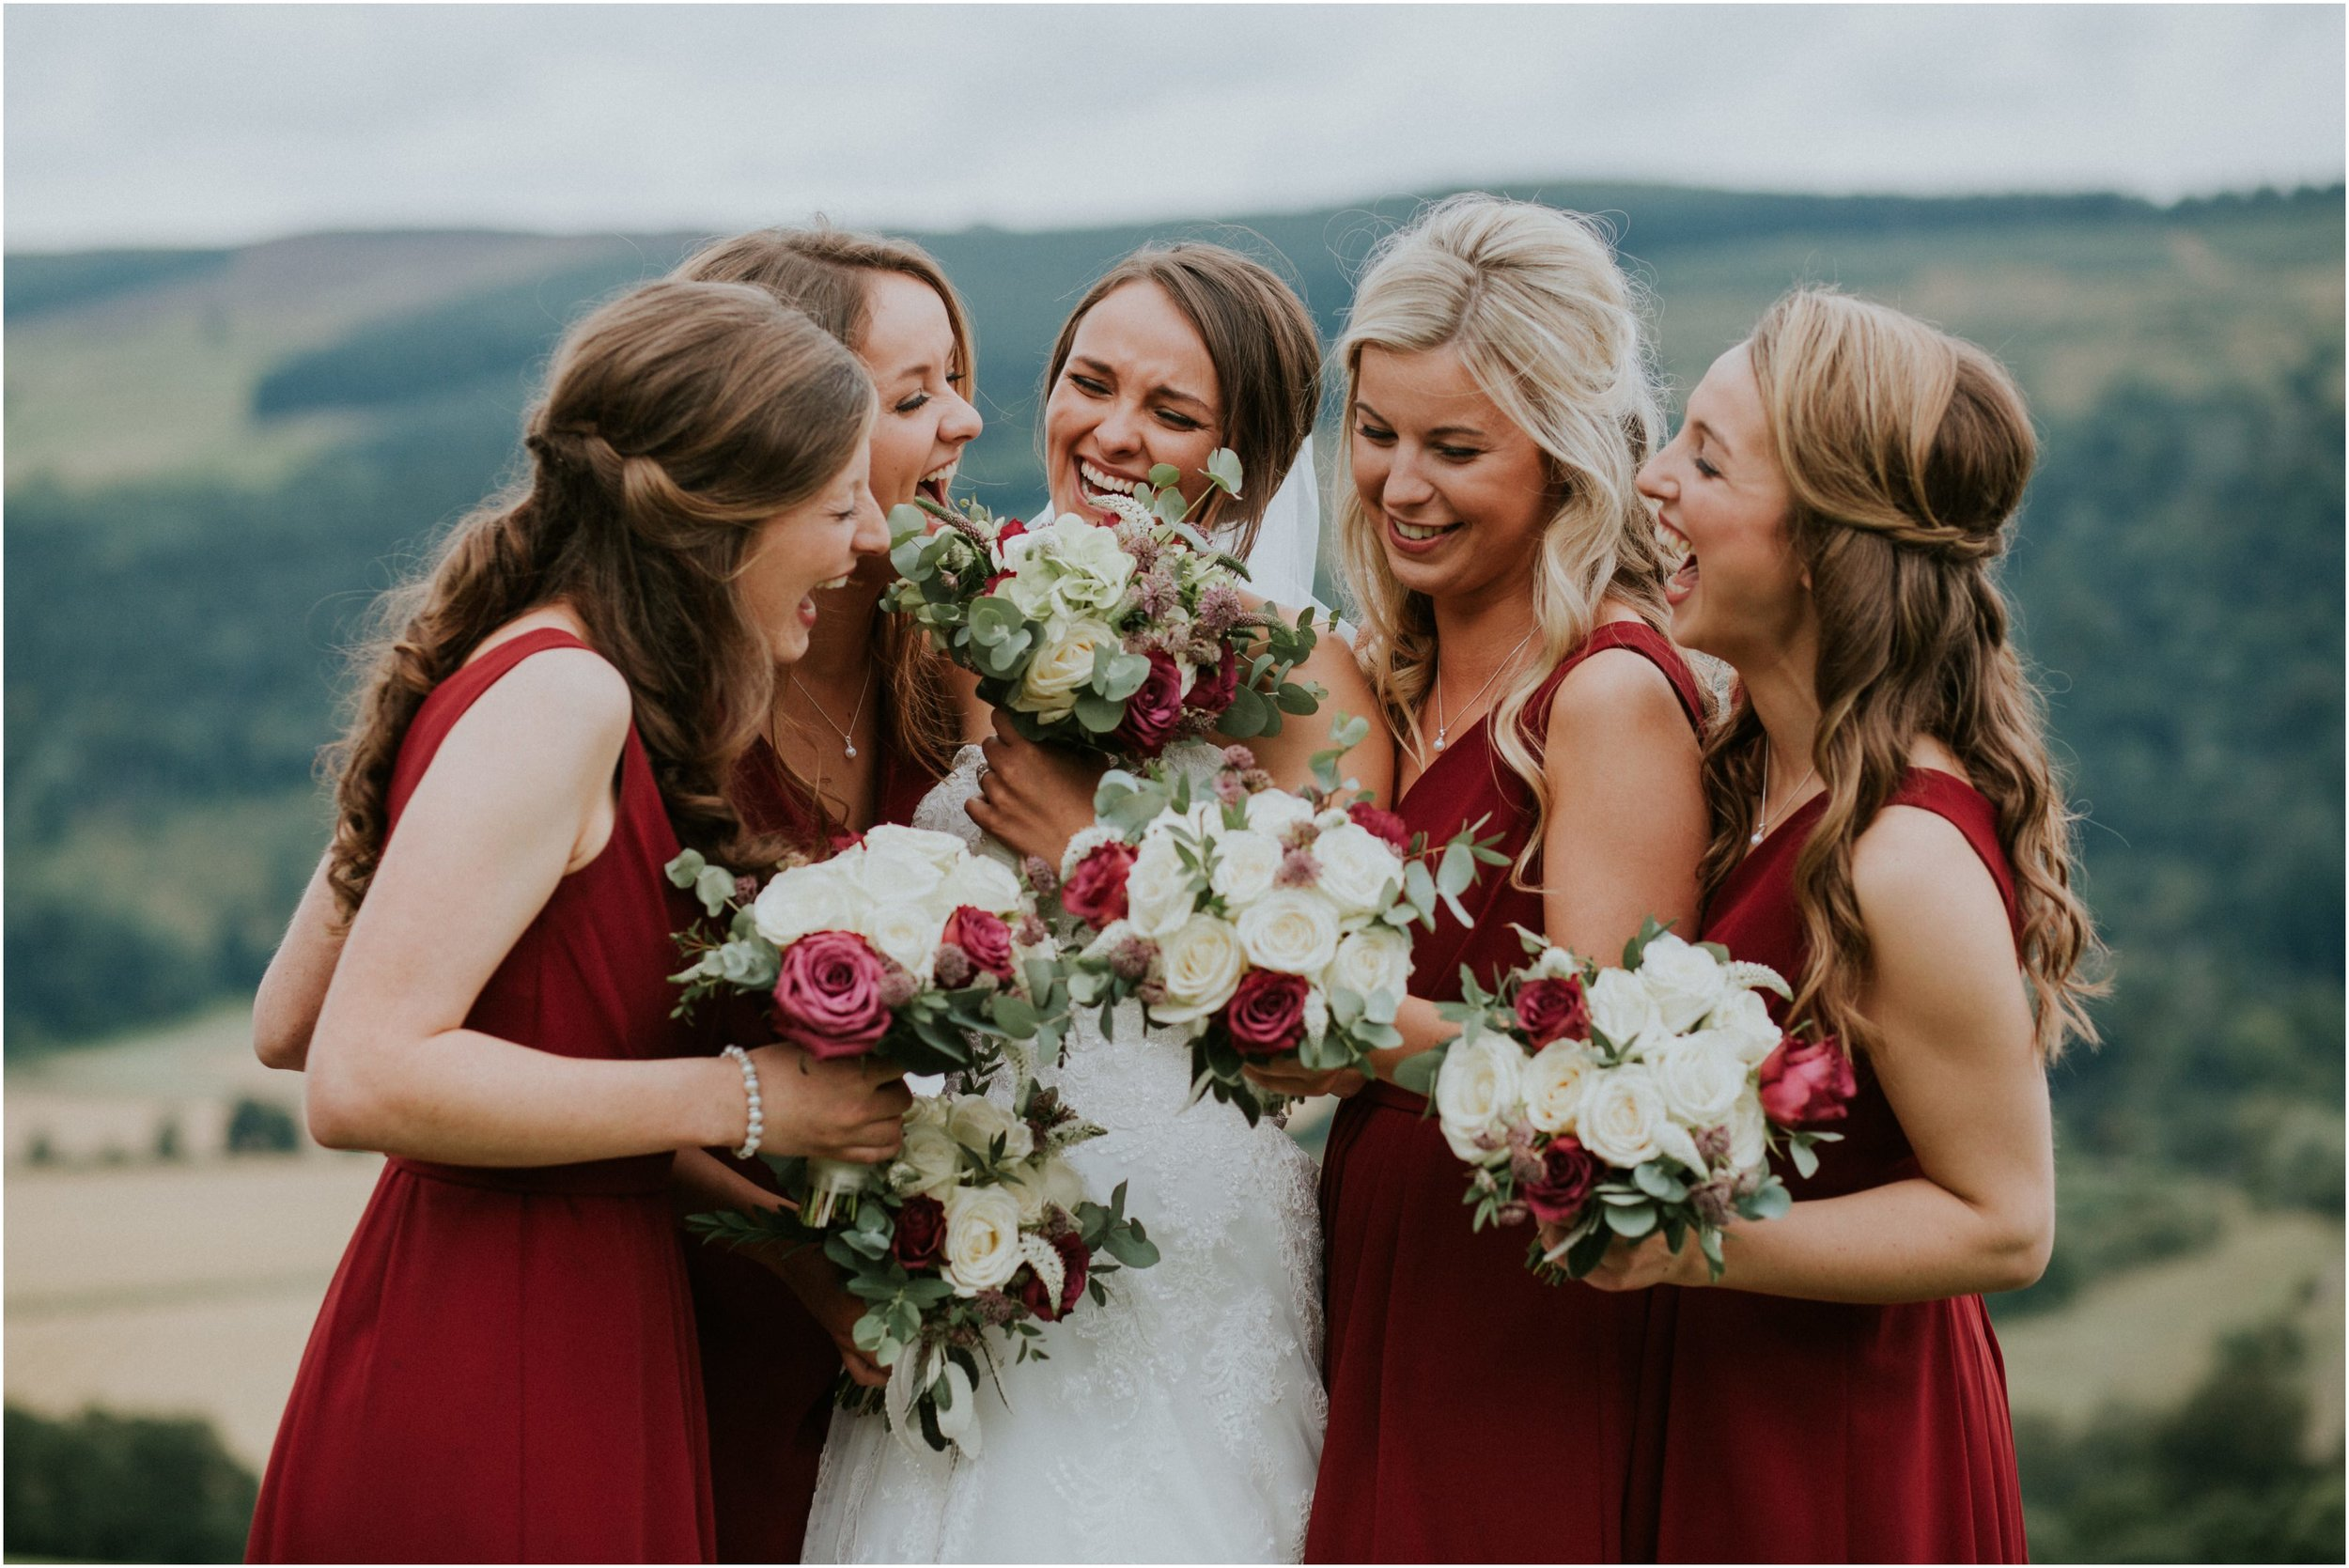 Photography 78 - Glasgow Wedding Photographer - Year in Reveiw_0090.jpg